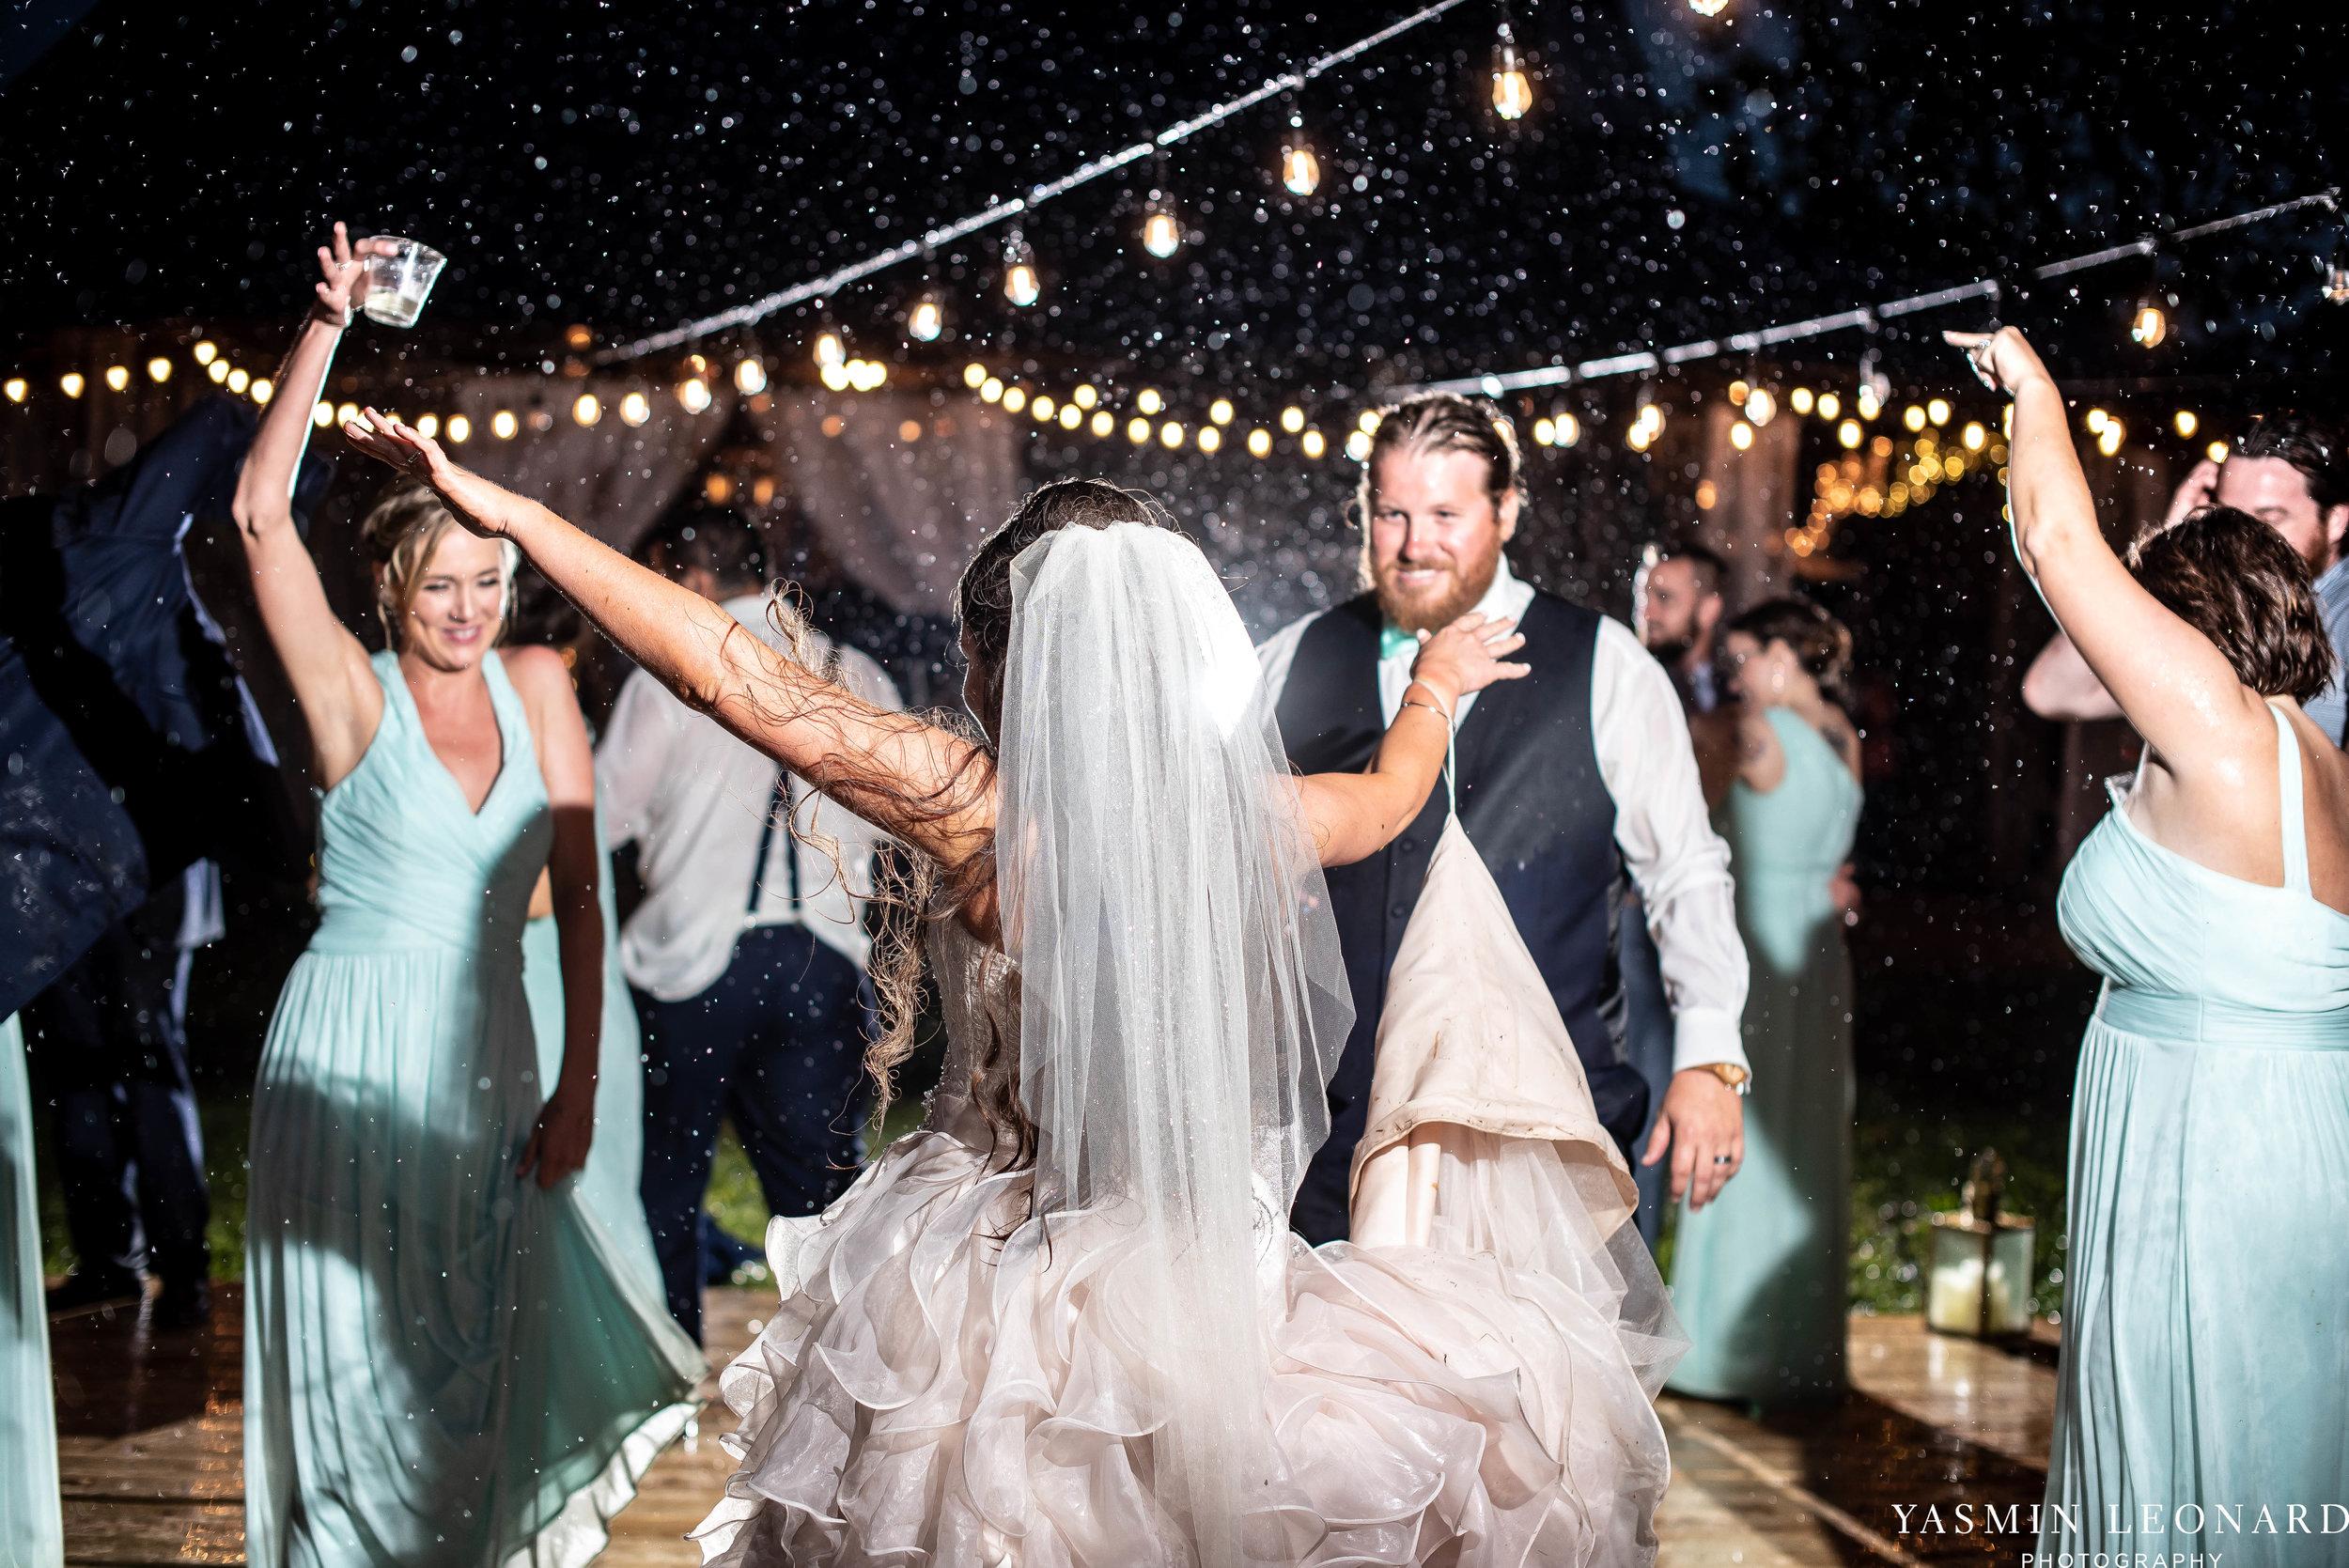 Rain on your wedding day - Rainy Wedding - Plan B for Rain - What to do if it rains on your wedding day - Wedding Inspiration - Outdoor wedding ideas - Rainy Wedding Pictures - Yasmin Leonard Photography-85.jpg